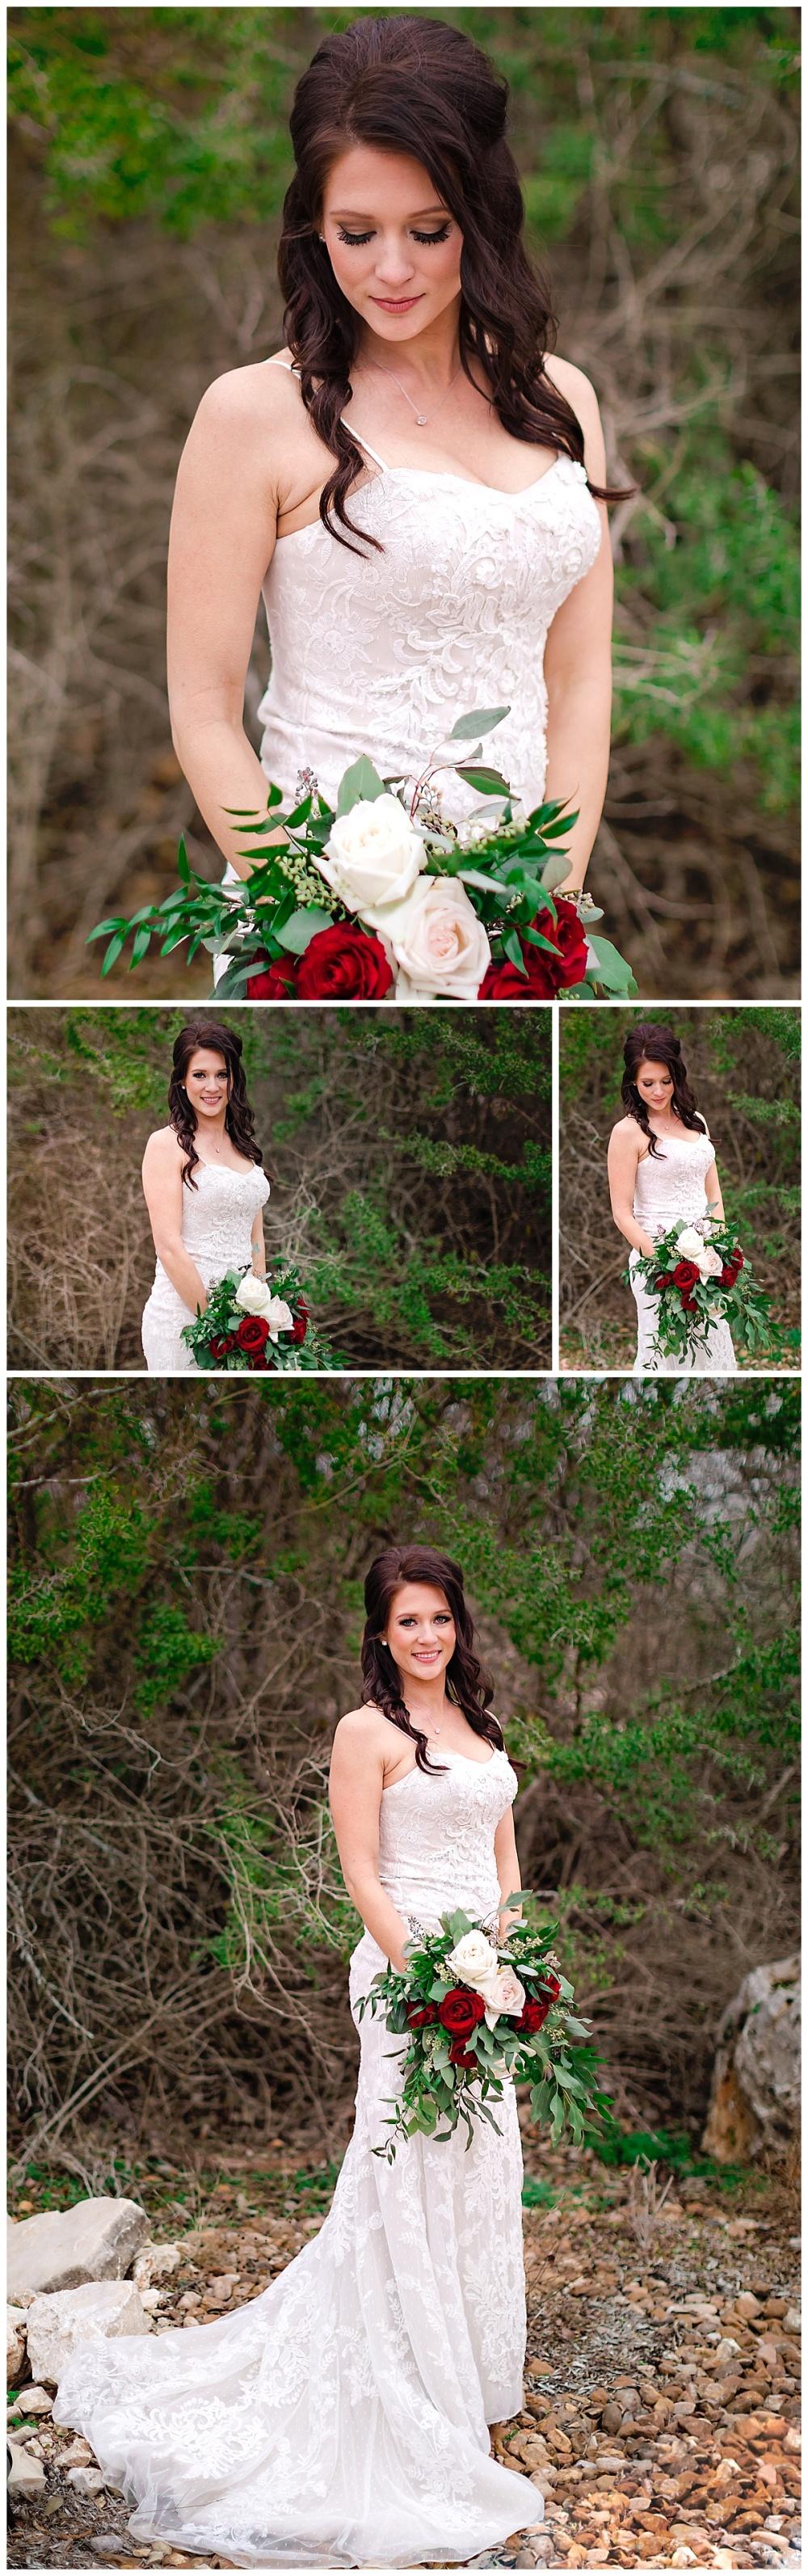 Carly-Barton-Photography-Geronimo-Oaks-Wedding-Venue-Texas-Hill-Country-Ronnie-Sarah_0071.jpg